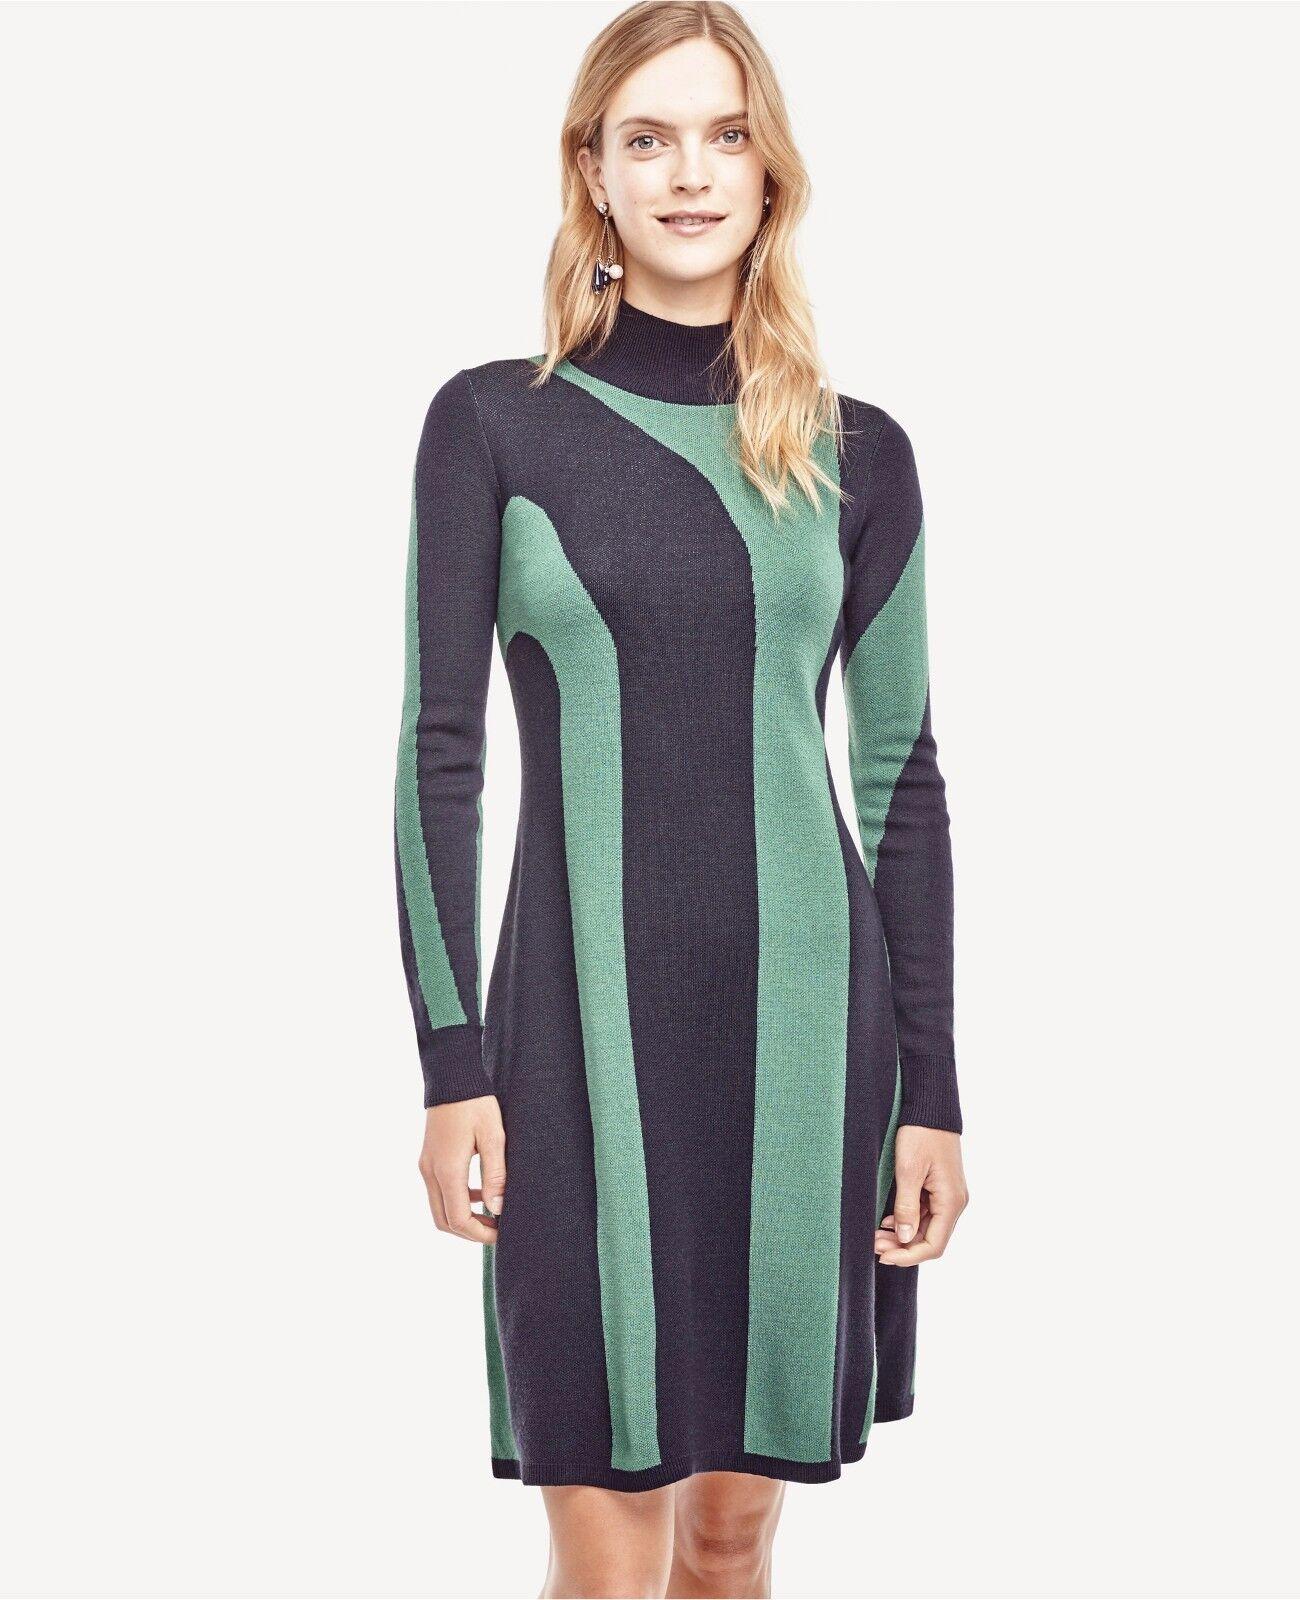 NWT ANN TAYLOR Abstract Stripe Mock Neck Sweater Dress Medium RV